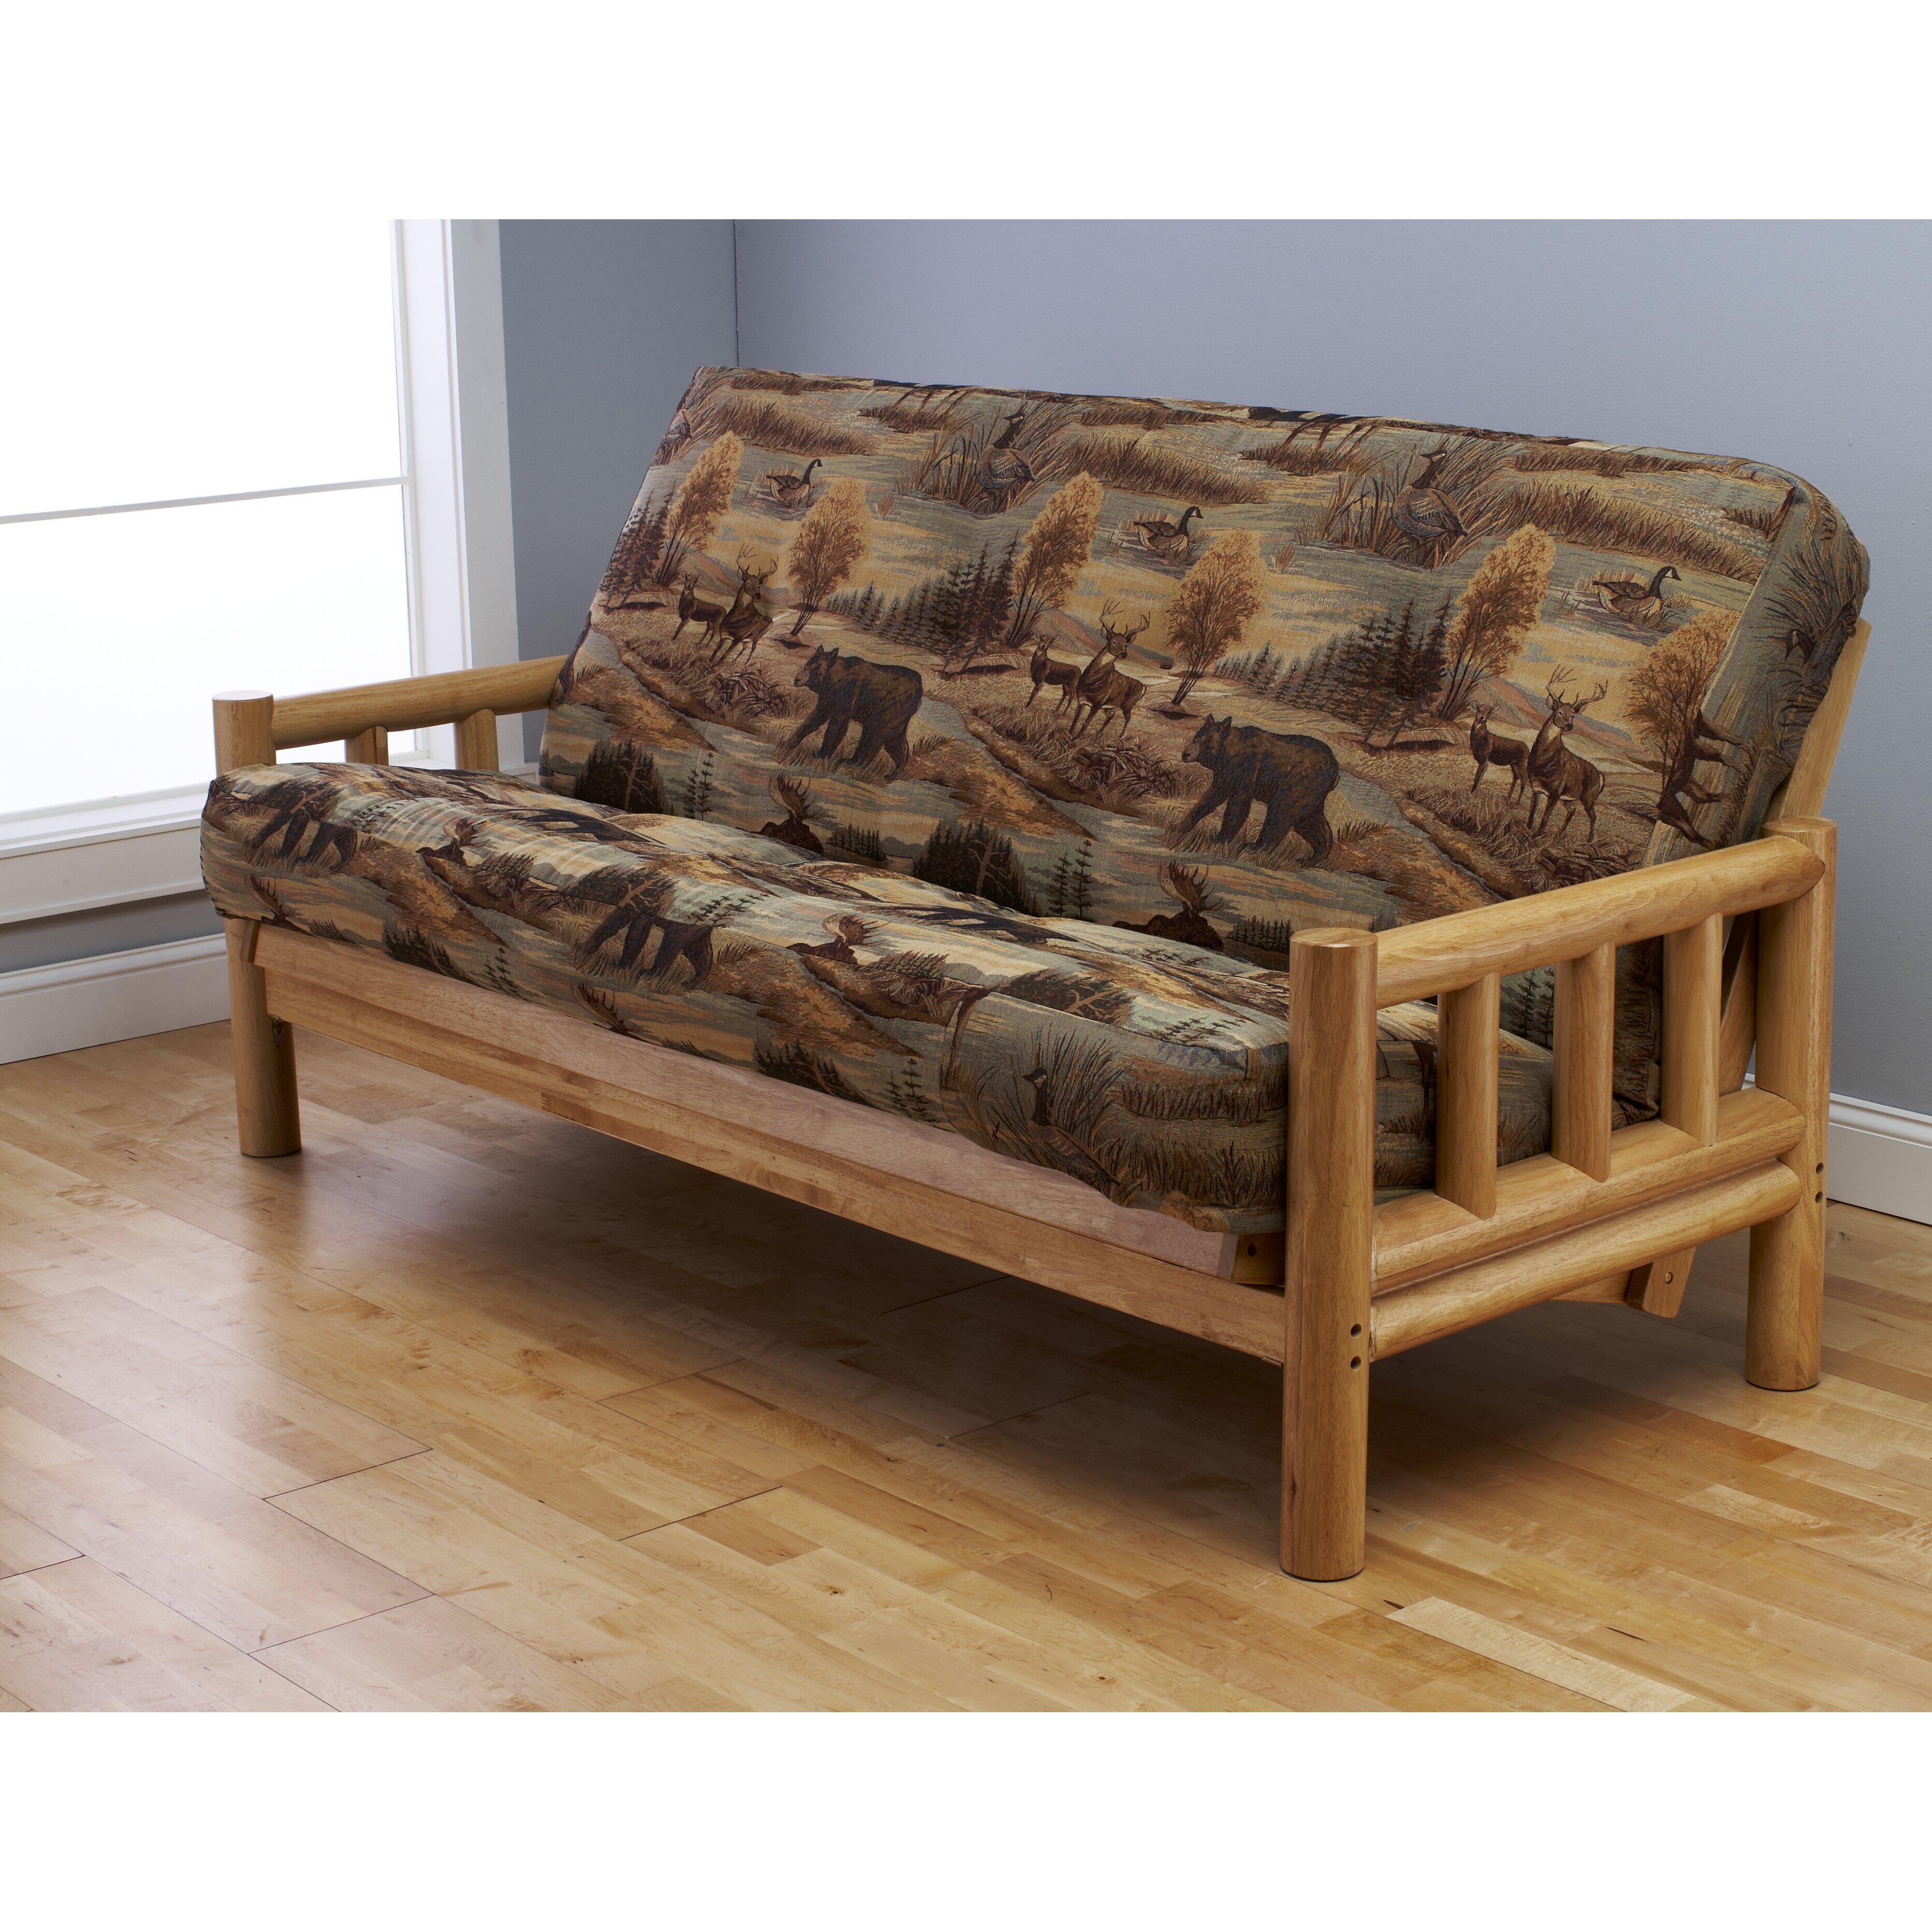 Kmart Bedroom Sets Kodiak Furniture Lodge Canadian Futon And Mattress